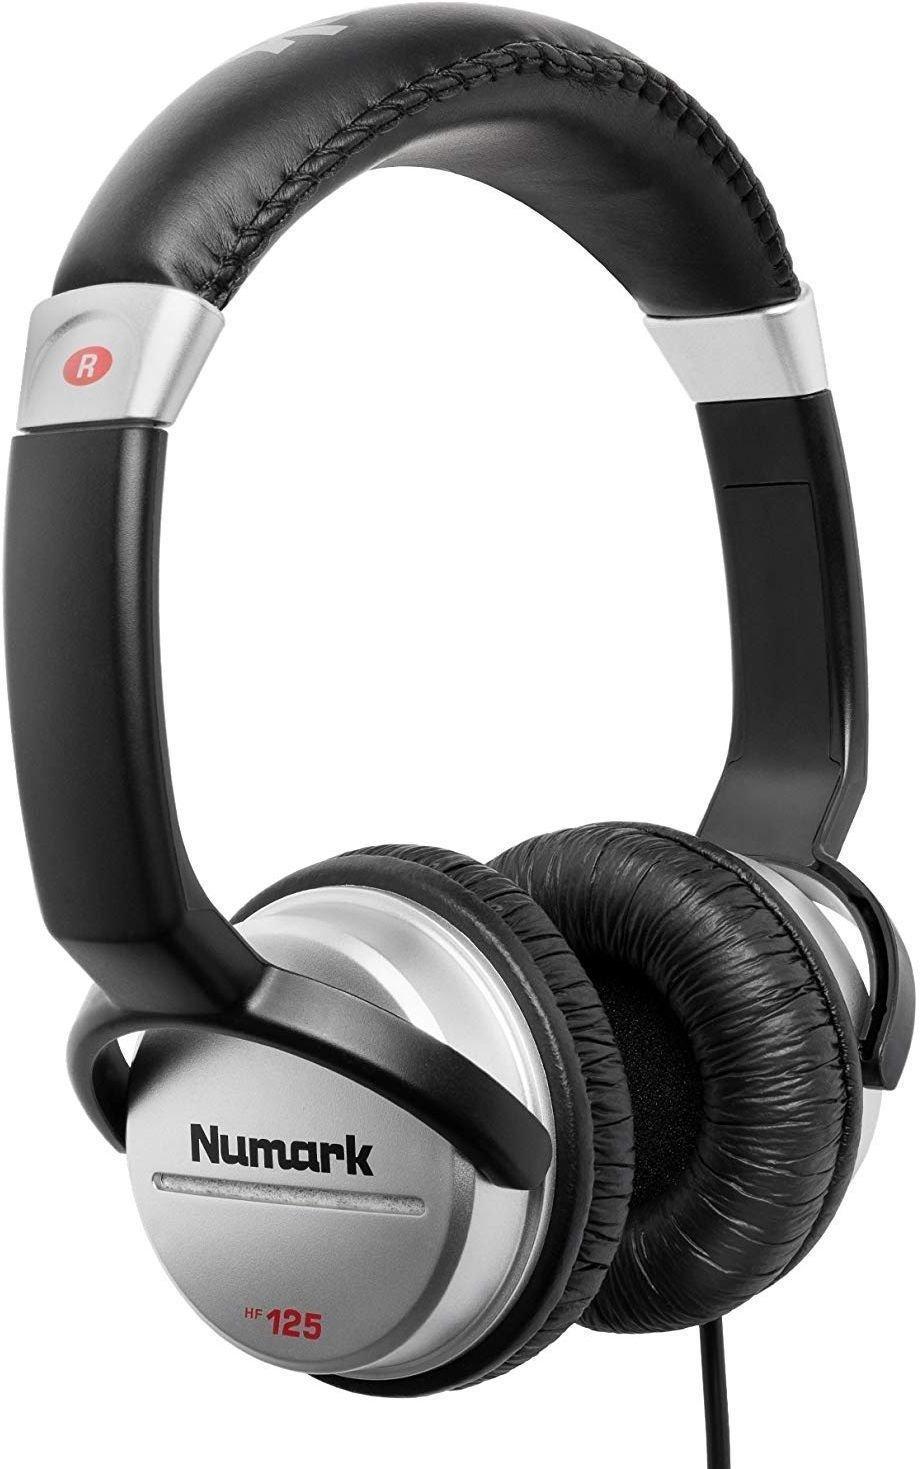 Numark HF-125 DJ Headphone